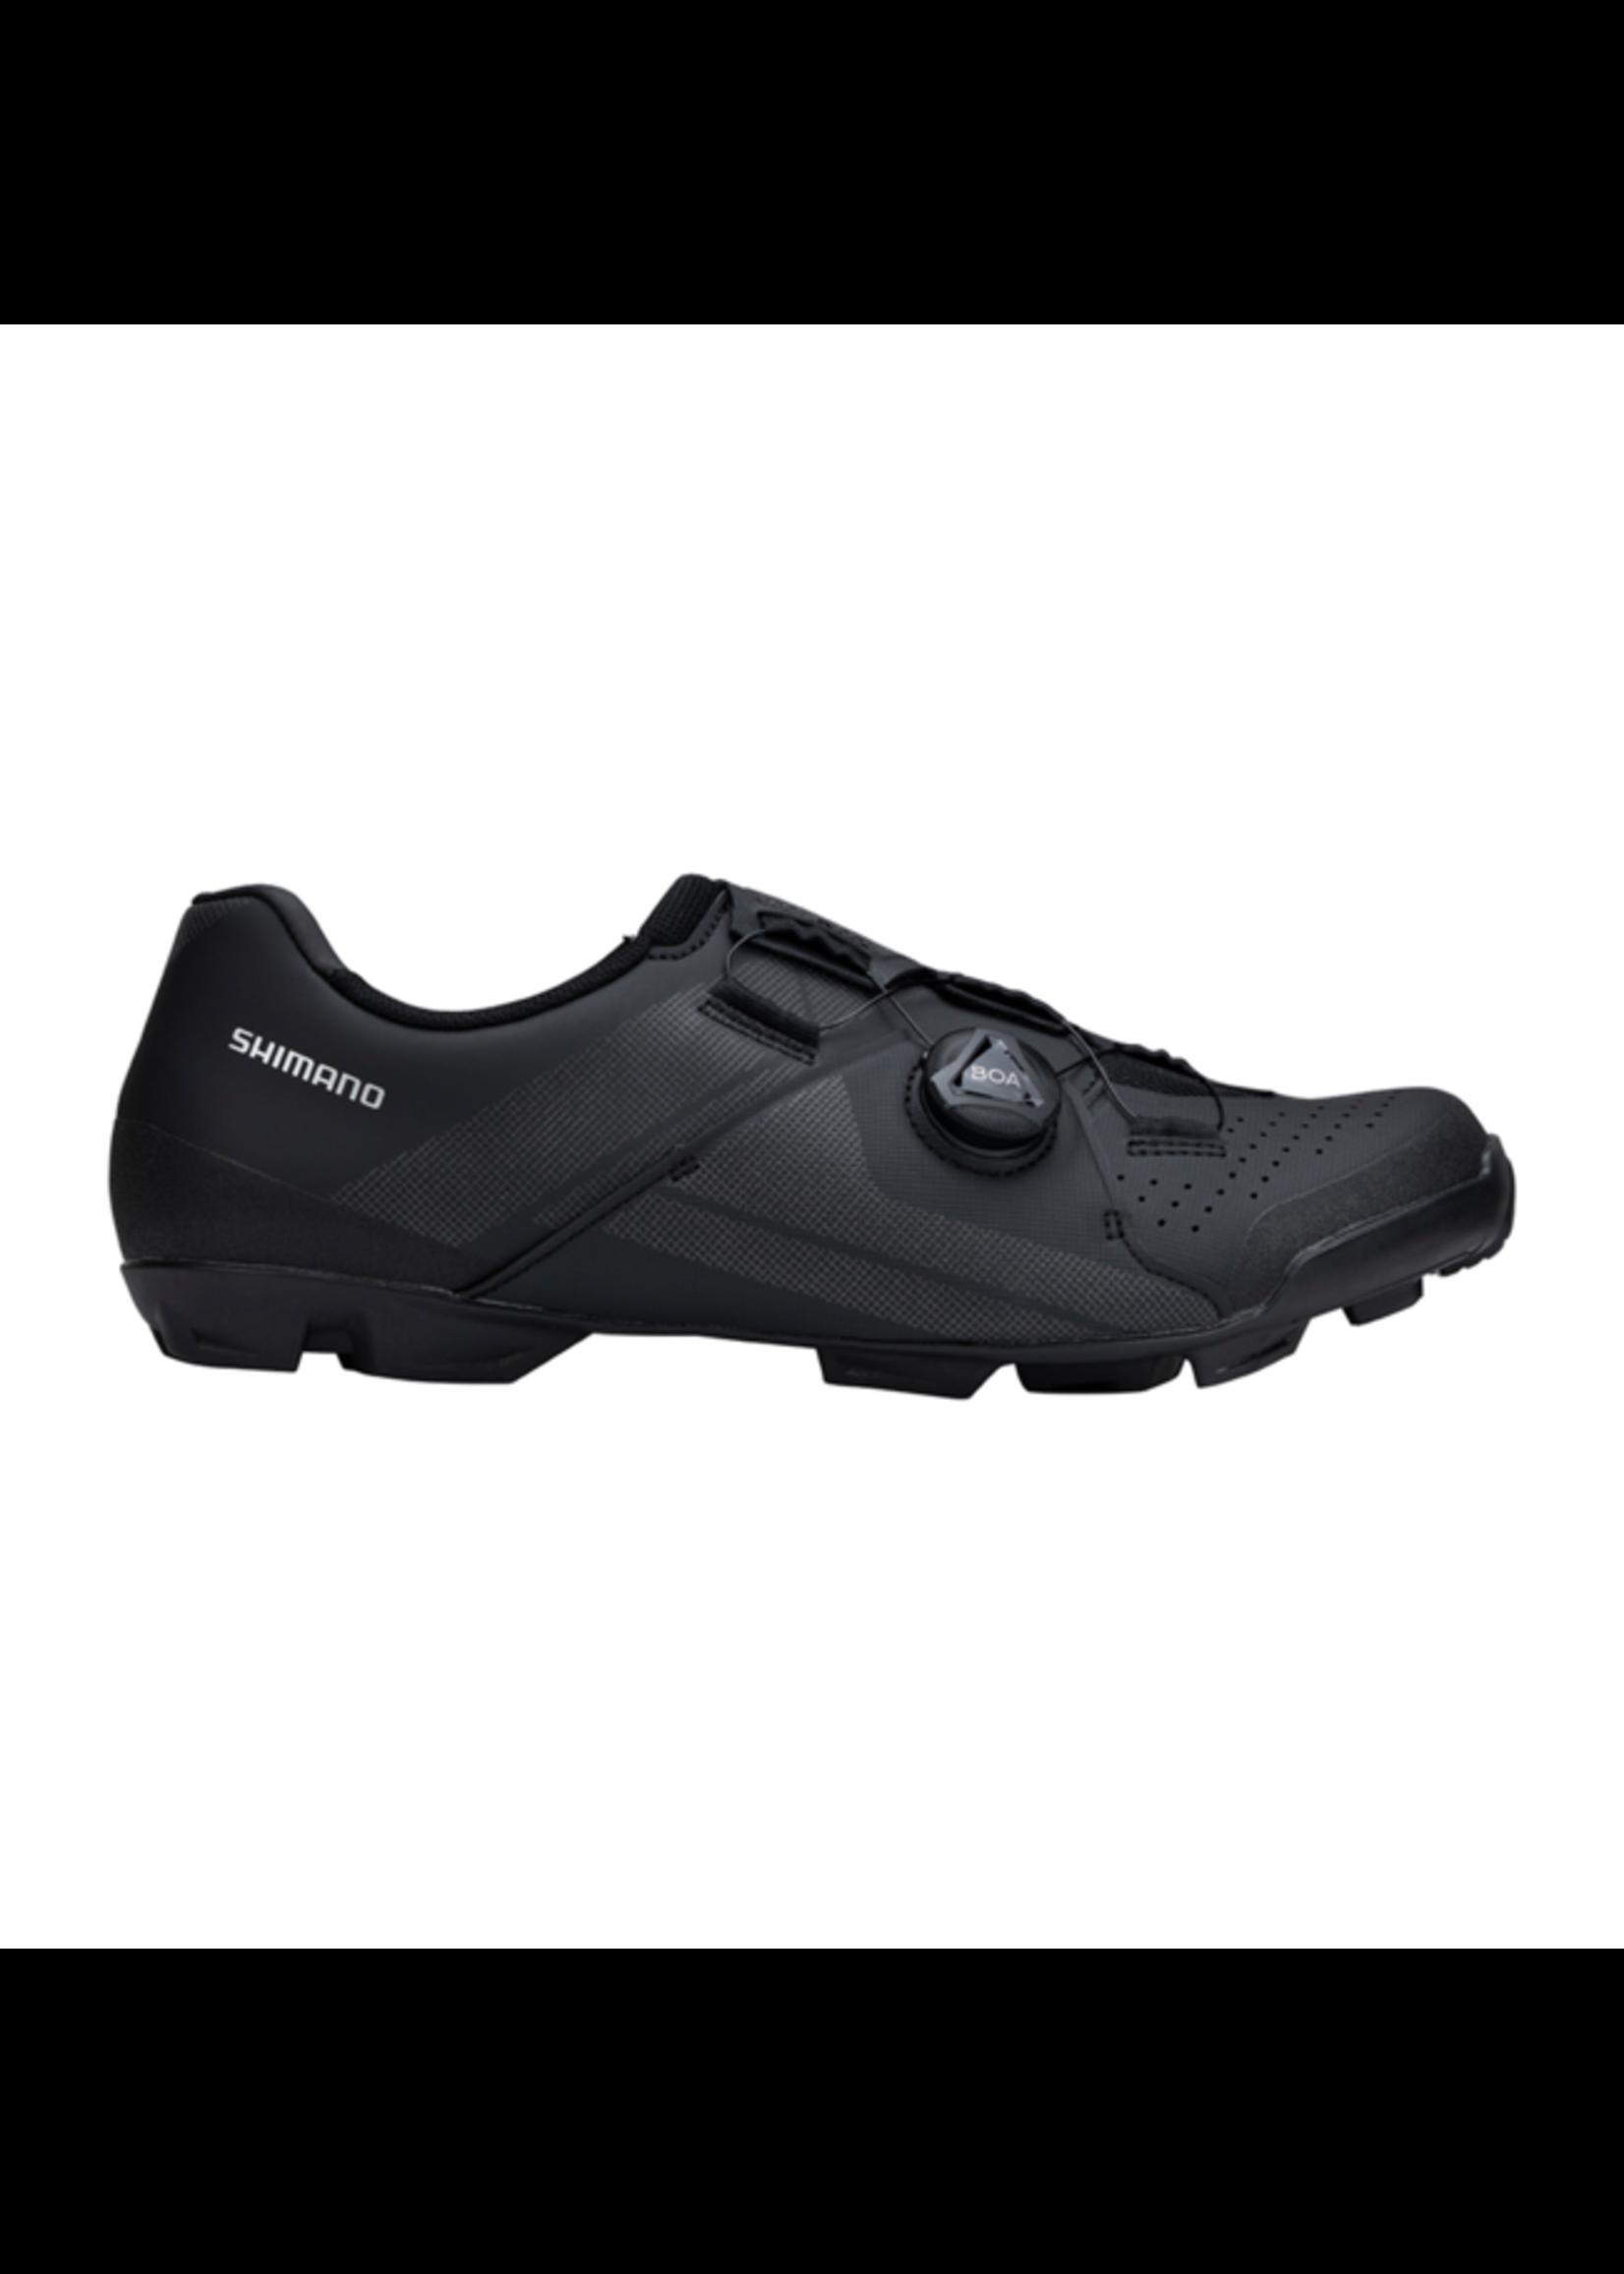 Shimano Shimano SH-XC300 Bicycle shoes Black